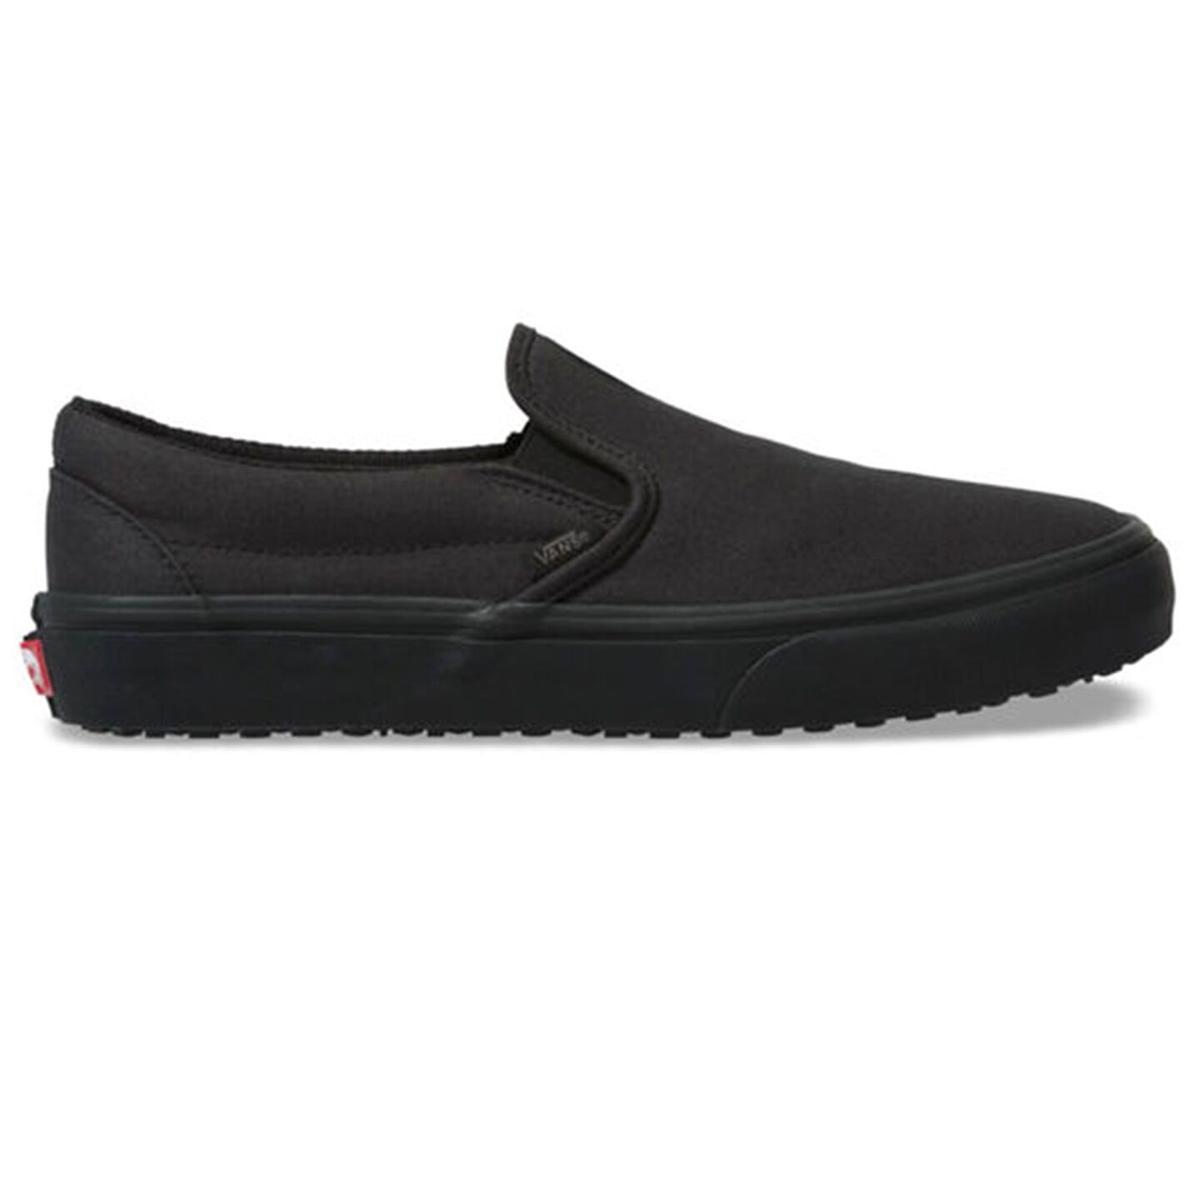 Vans Men's Classic Slip On Casual Shoes